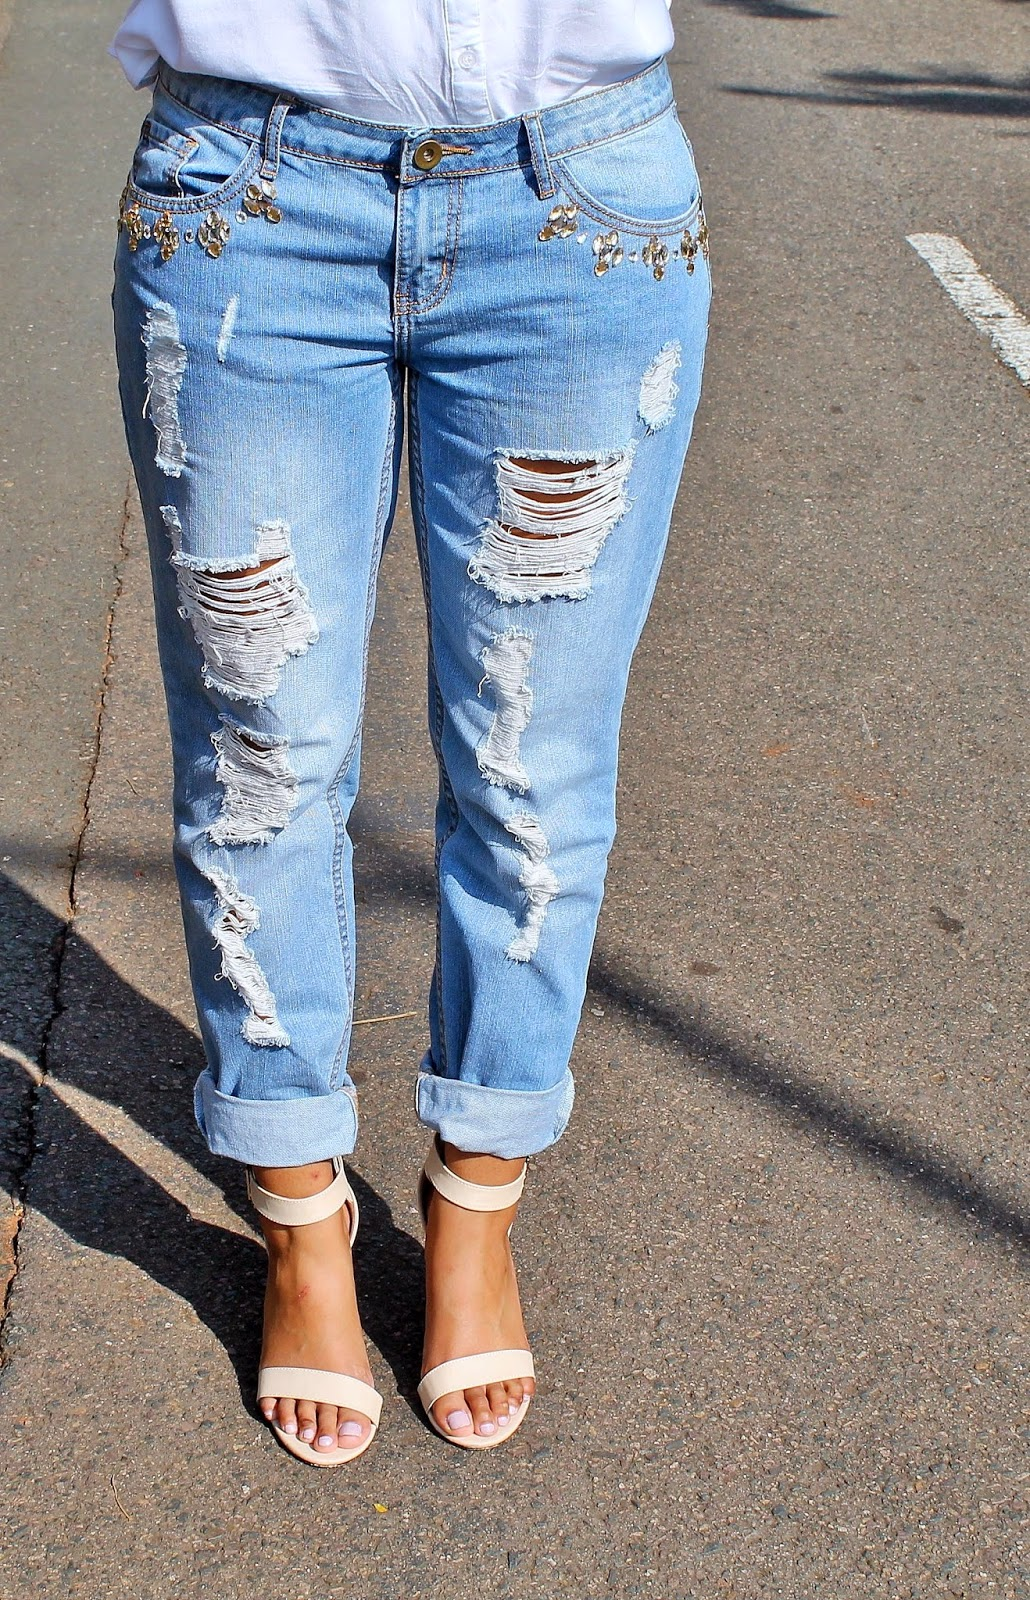 Kotton&Silk: Crisp White & BF Jeans